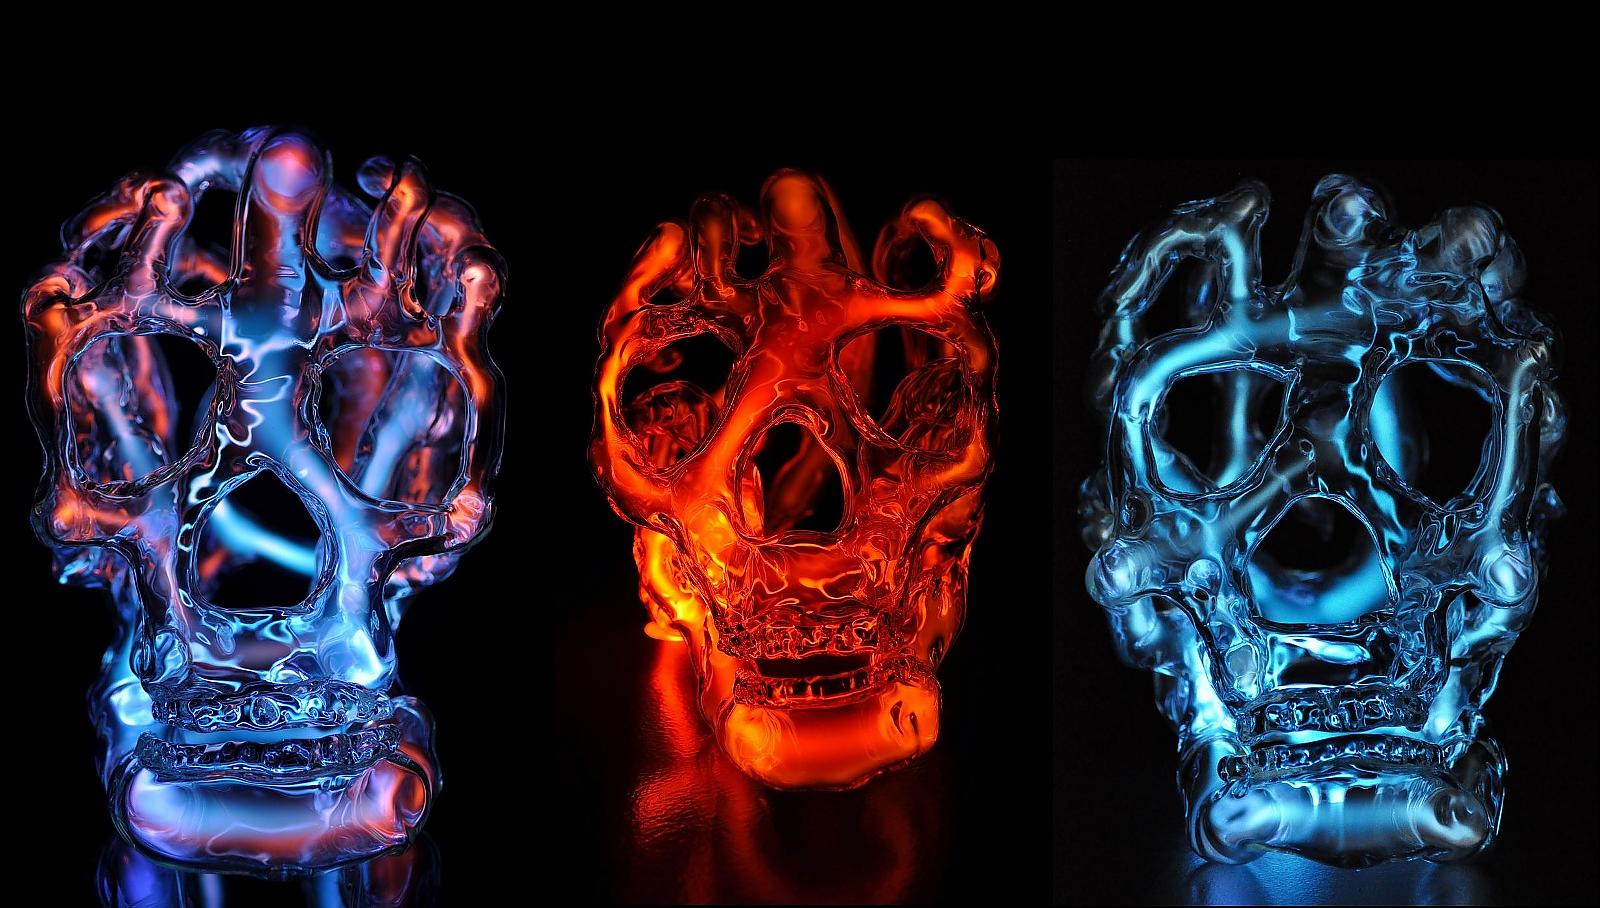 Luminous Skull Sculptures by Eric Franklin